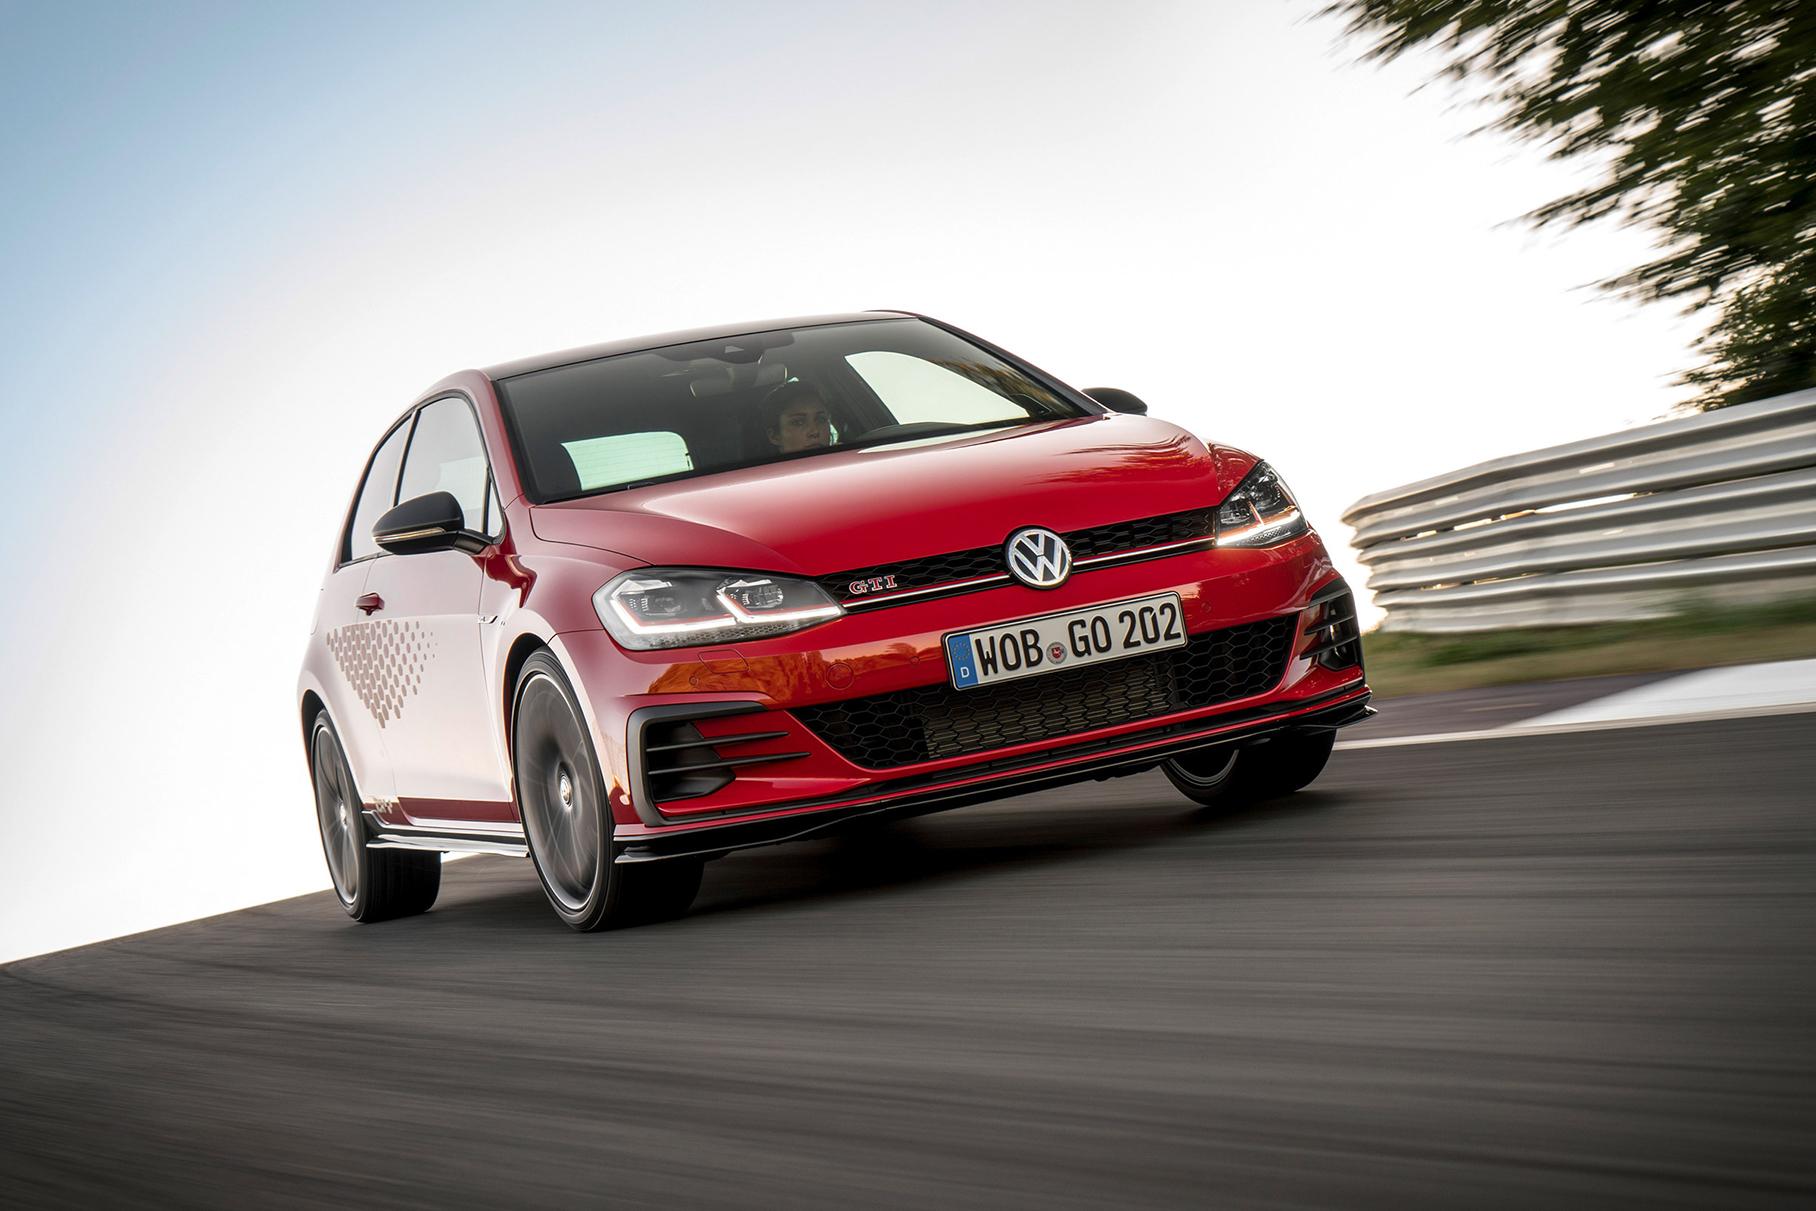 Volkswagen построил самый мощный и быстрый Golf GTI